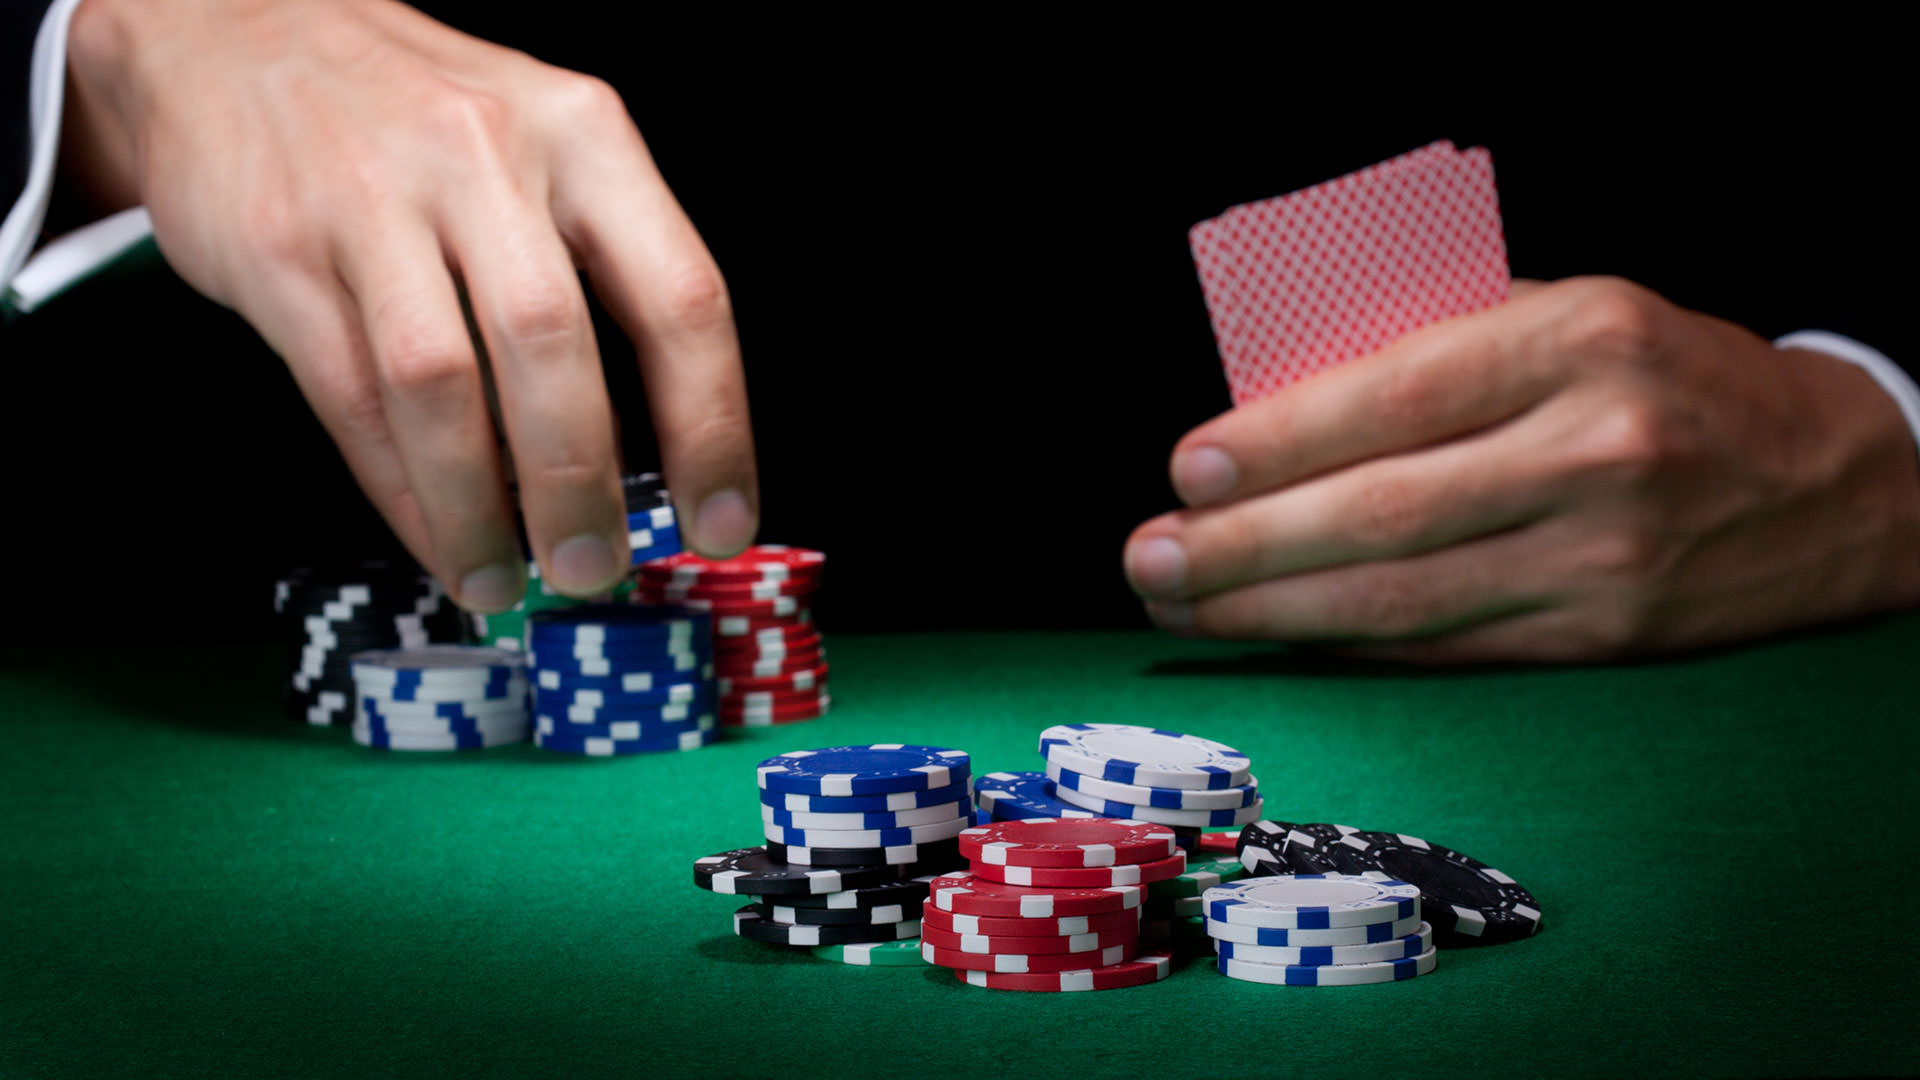 Casino solverde espinho poker casino niagara niagara falls ontario